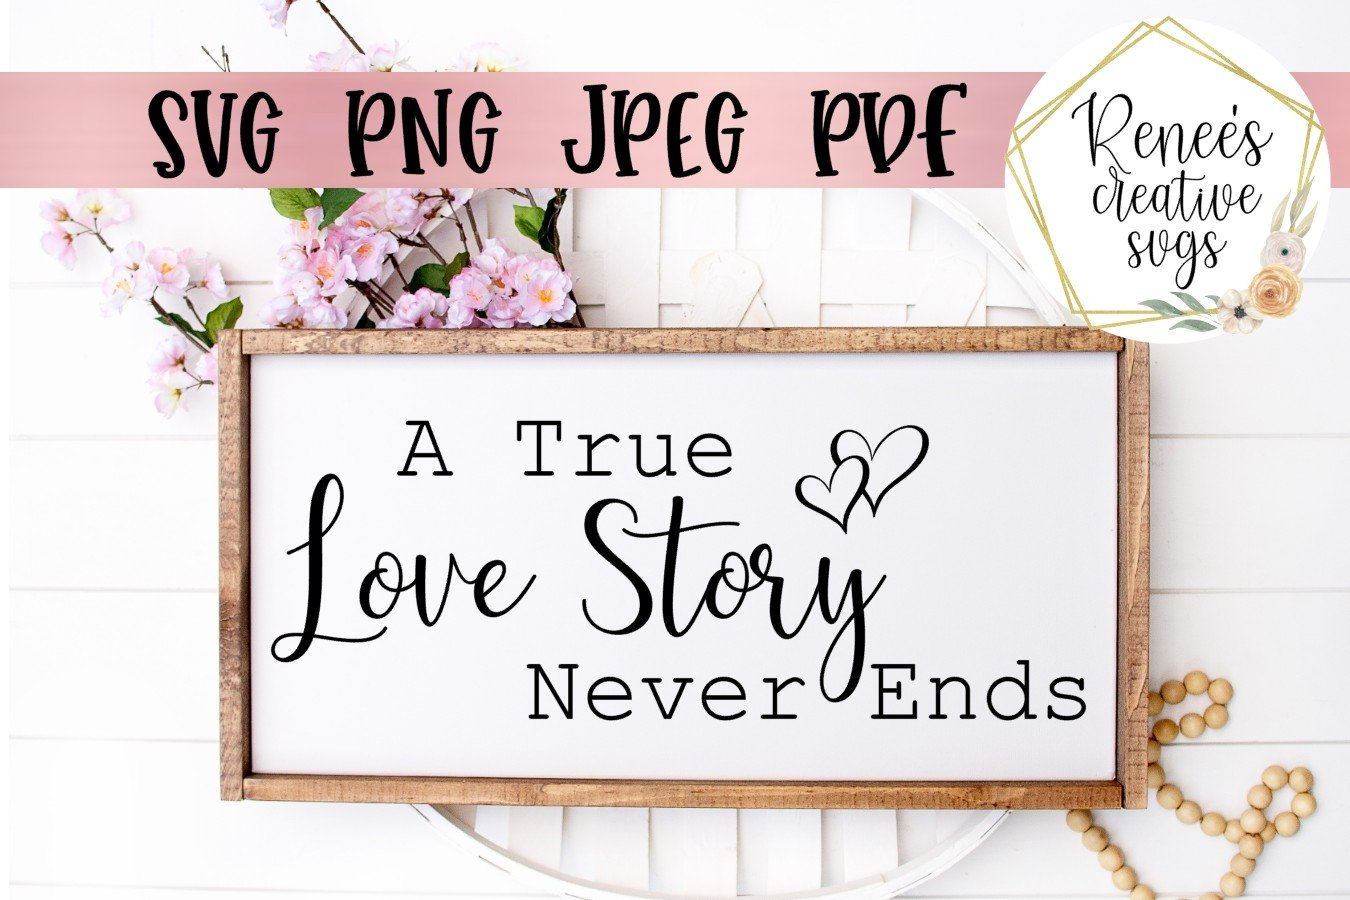 A True Love Story Never Ends Wedding Quotes Svg Cut File 364438 Svgs Design Bundles